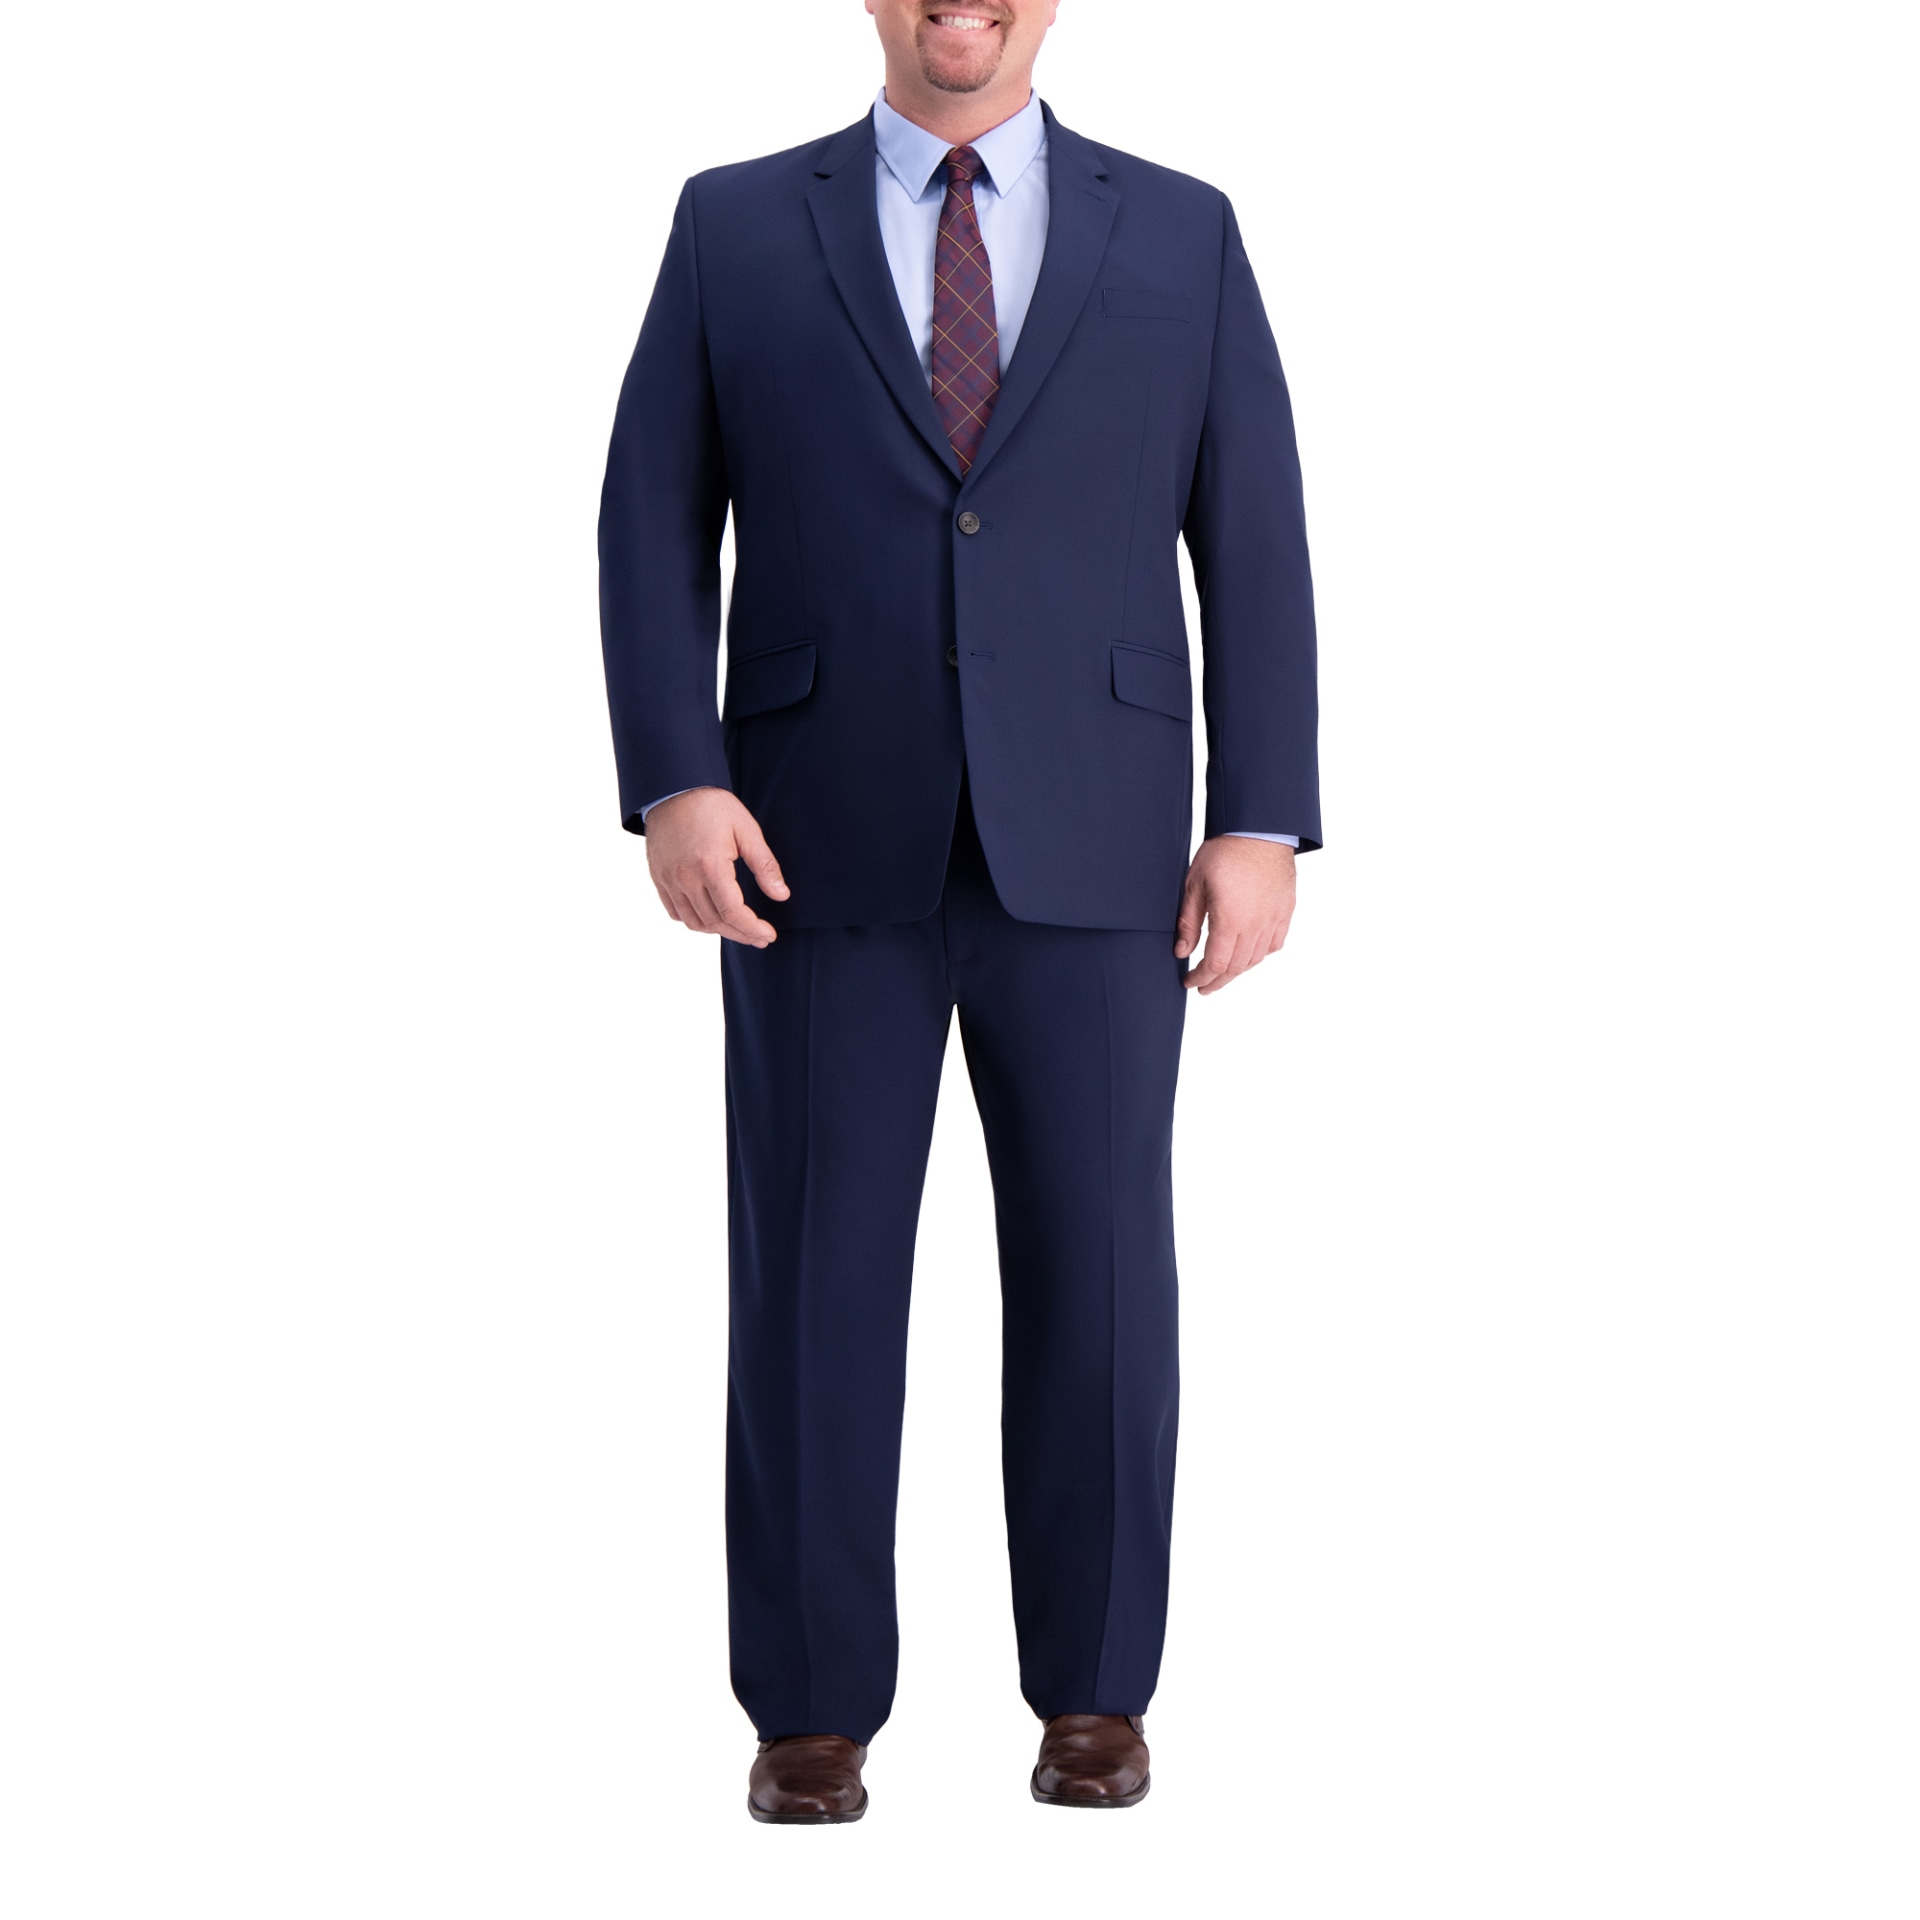 Haggar Mens 4-Way Stretch Solid Gab Slim Fit Suit Separate Coat Business Suit Jacket J.M